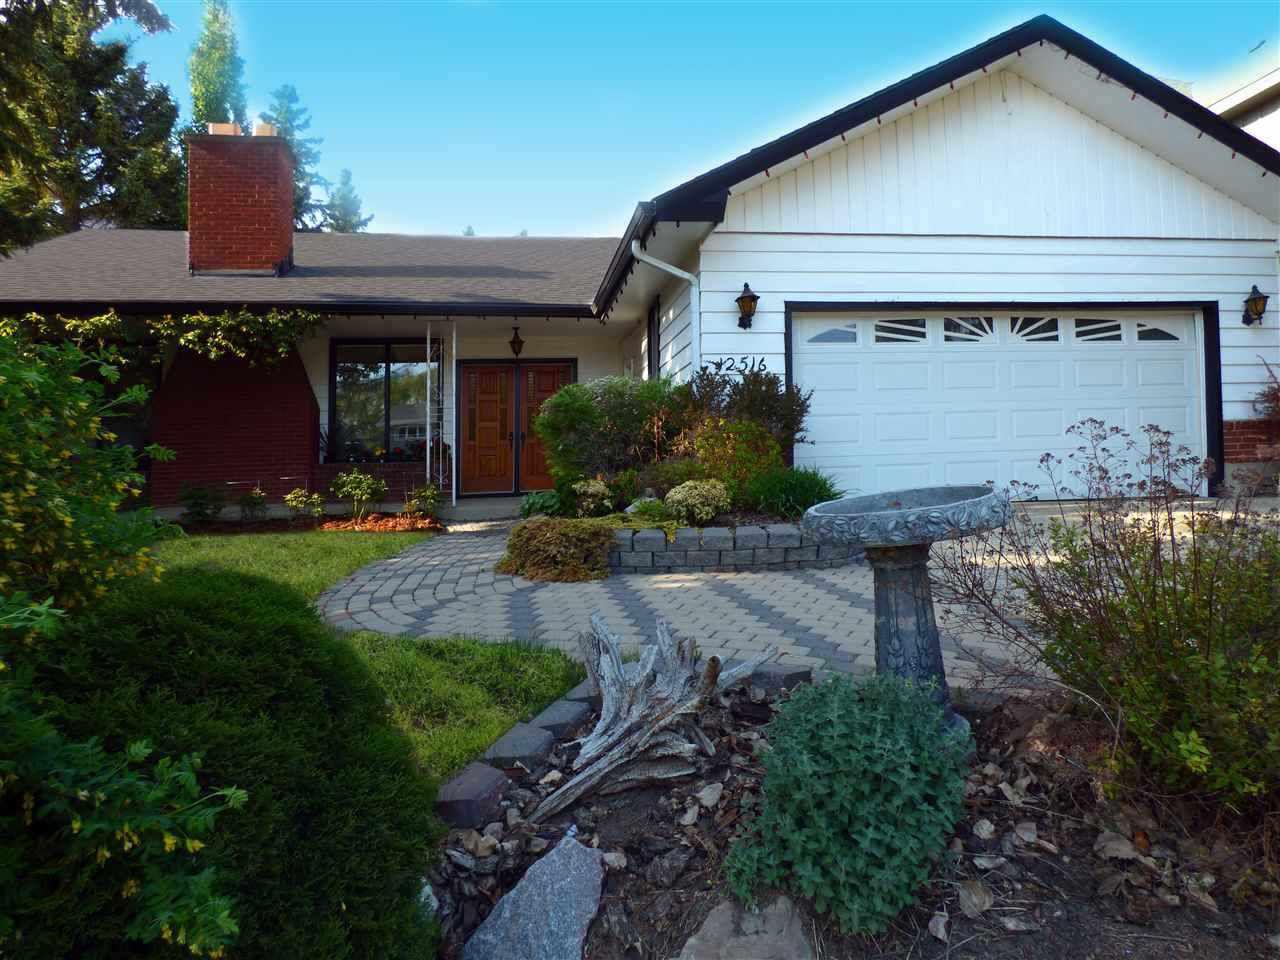 Main Photo: 12516 39 Avenue in Edmonton: Zone 16 House for sale : MLS®# E4142701